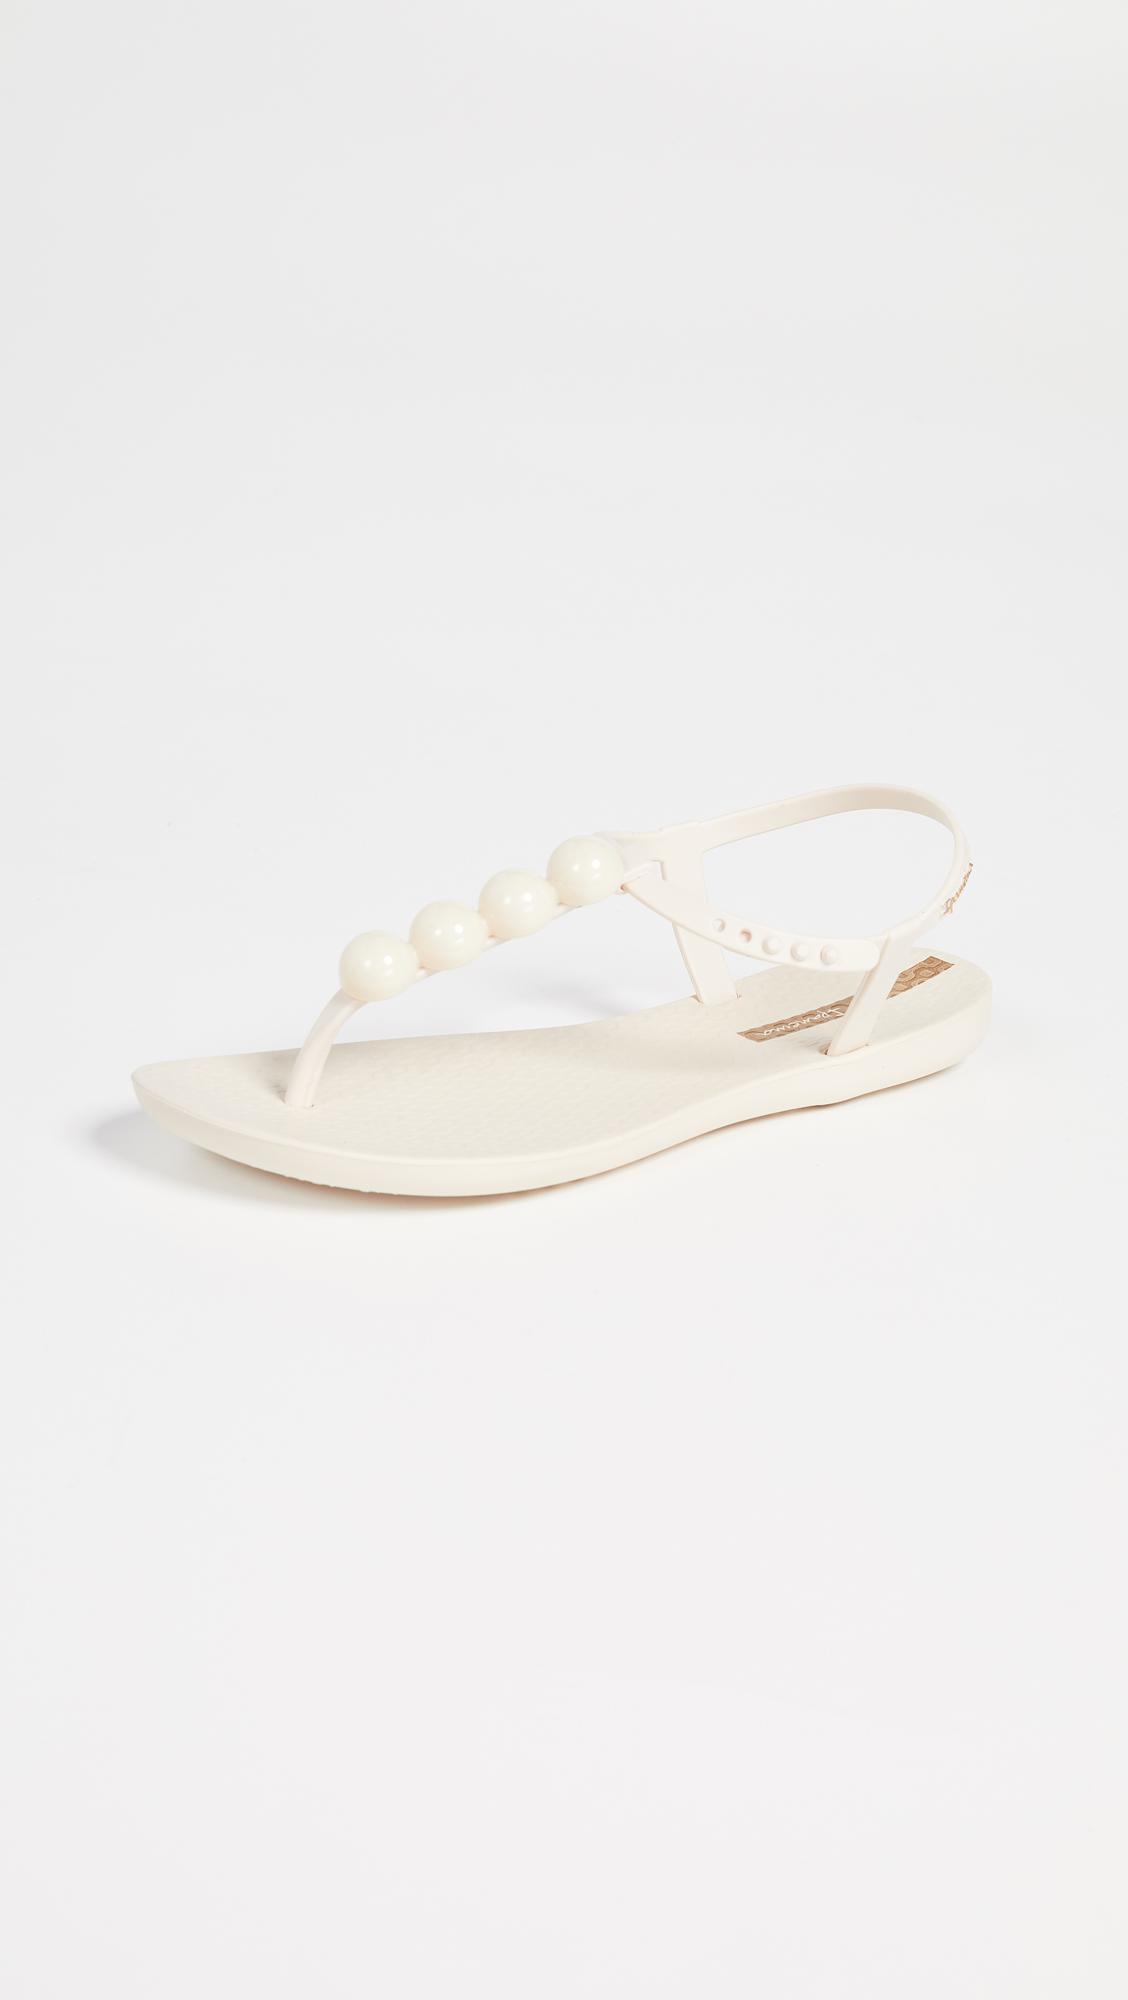 b1370313440c Ipanema Pearl T-strap Sandals in Natural - Lyst